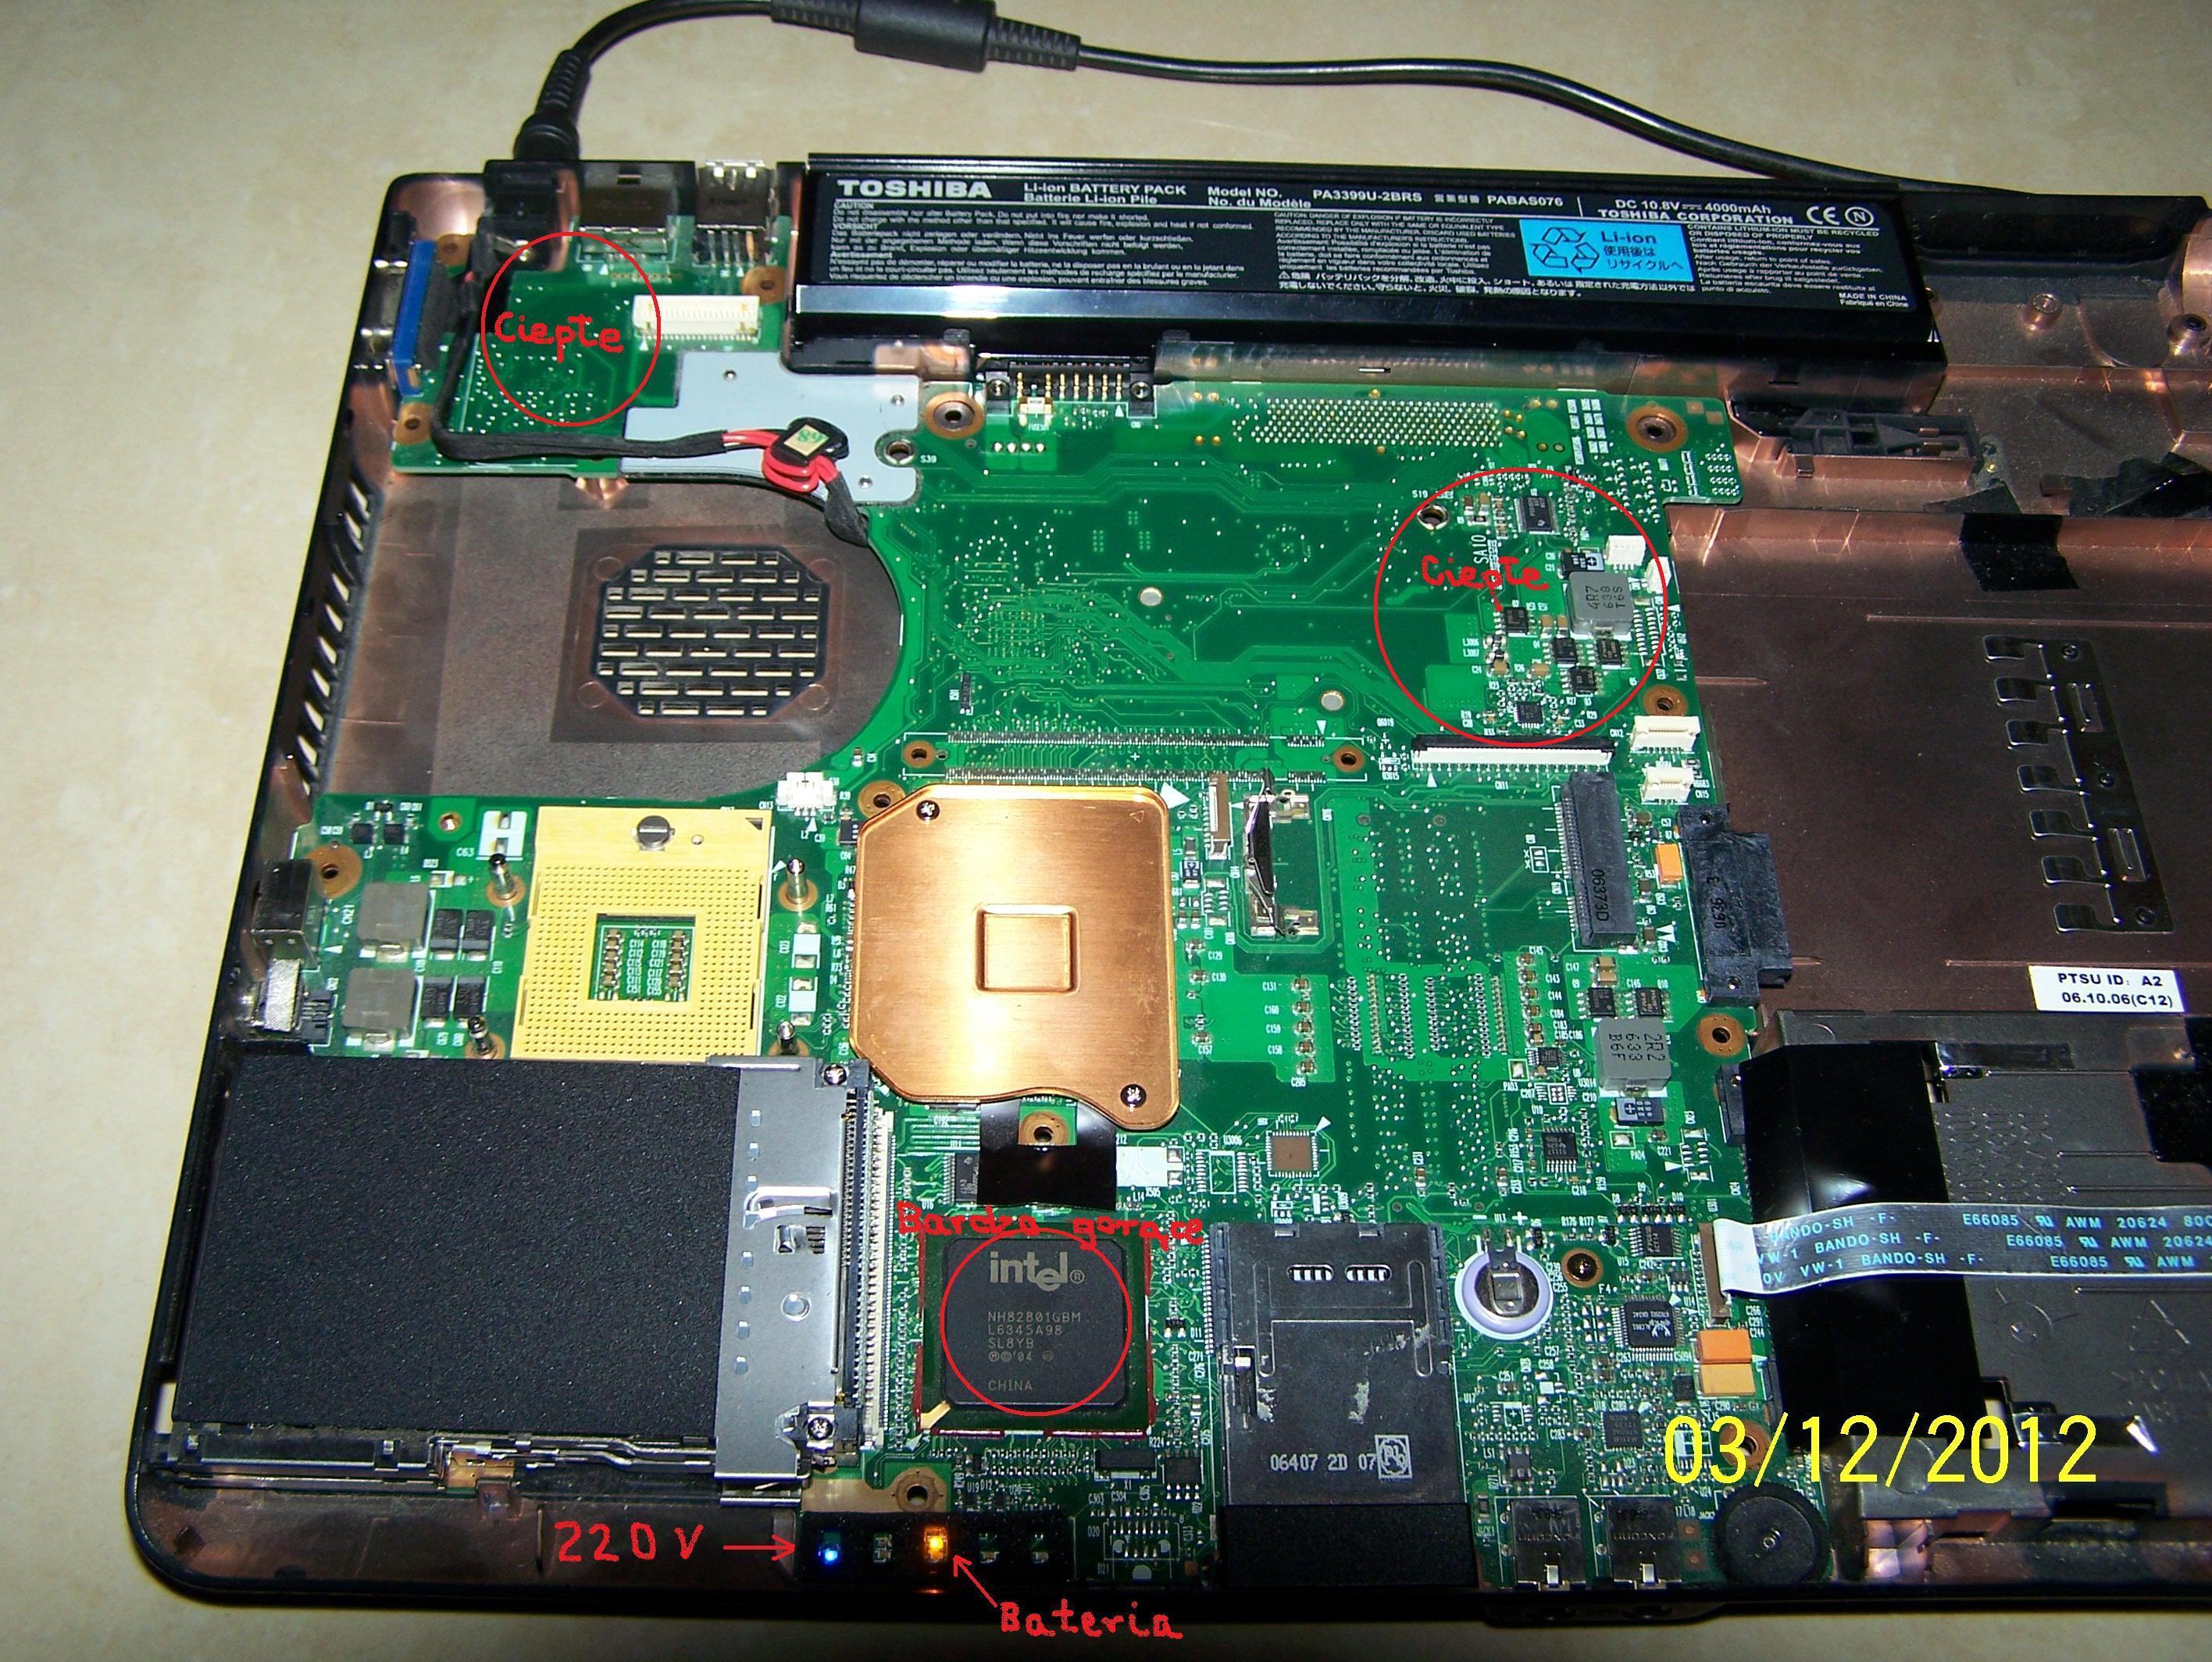 Toshiba a100 sd card driver for windows 7.